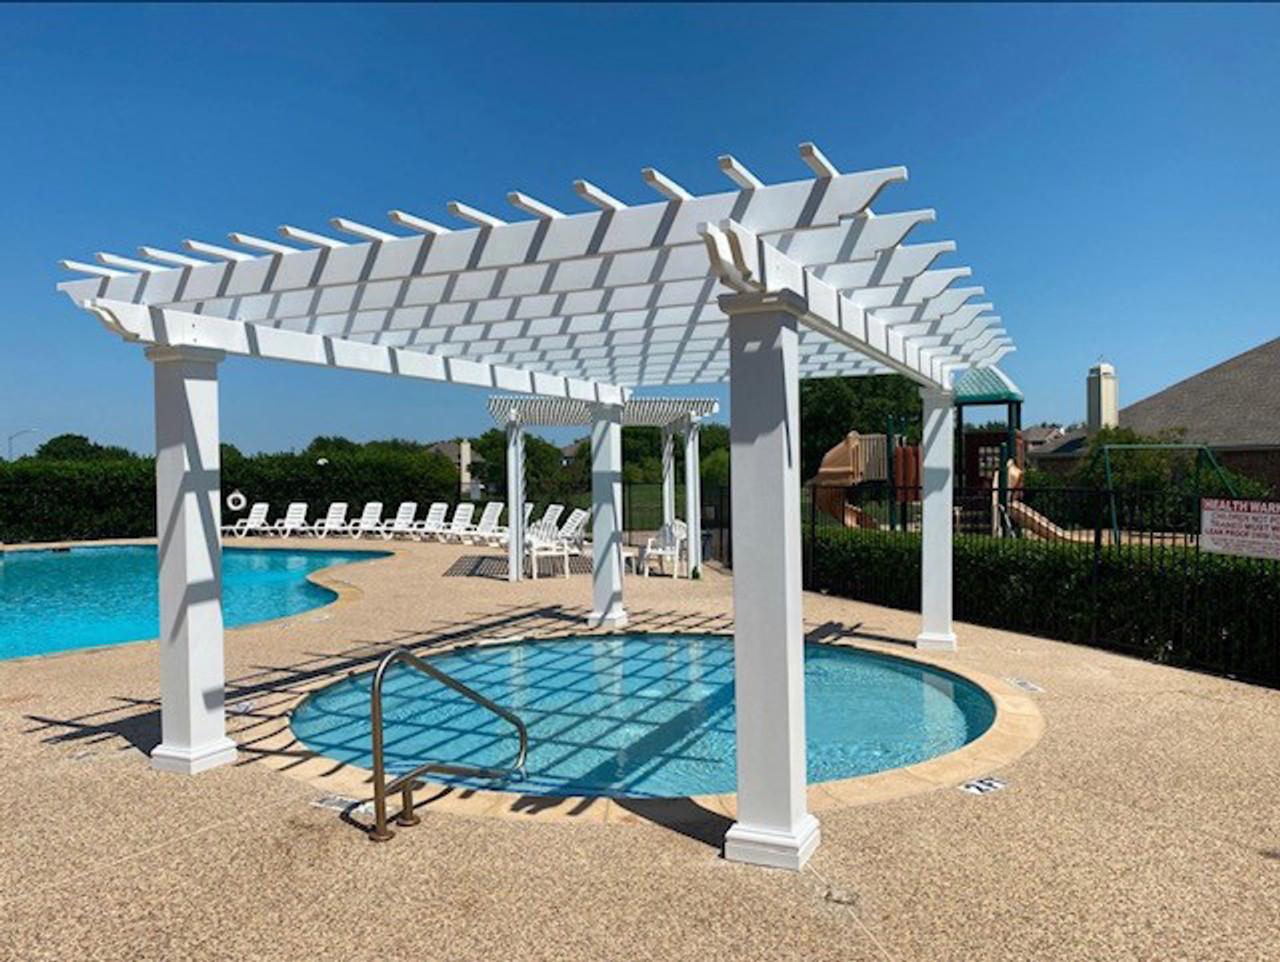 18x12 Poolside Fiberglass Pergola Garland, Texas